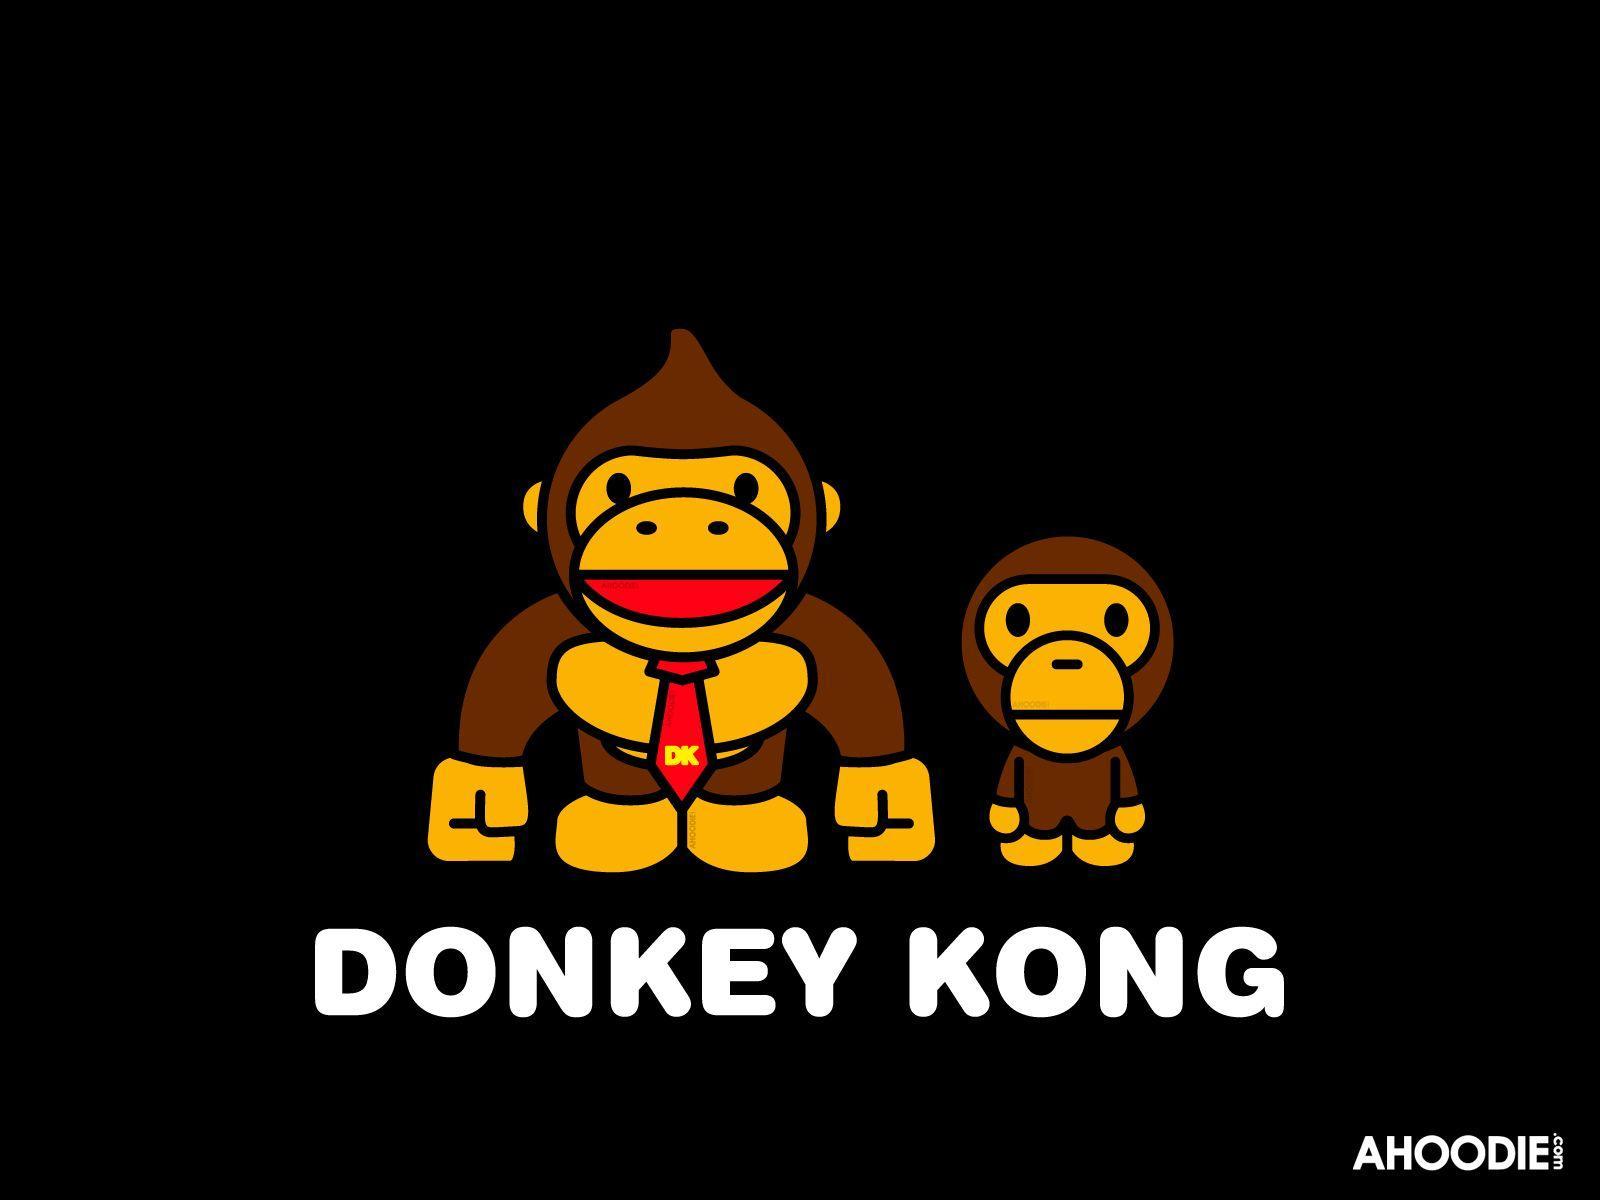 Donkey Kong Wallpapers Wallpaper Cave